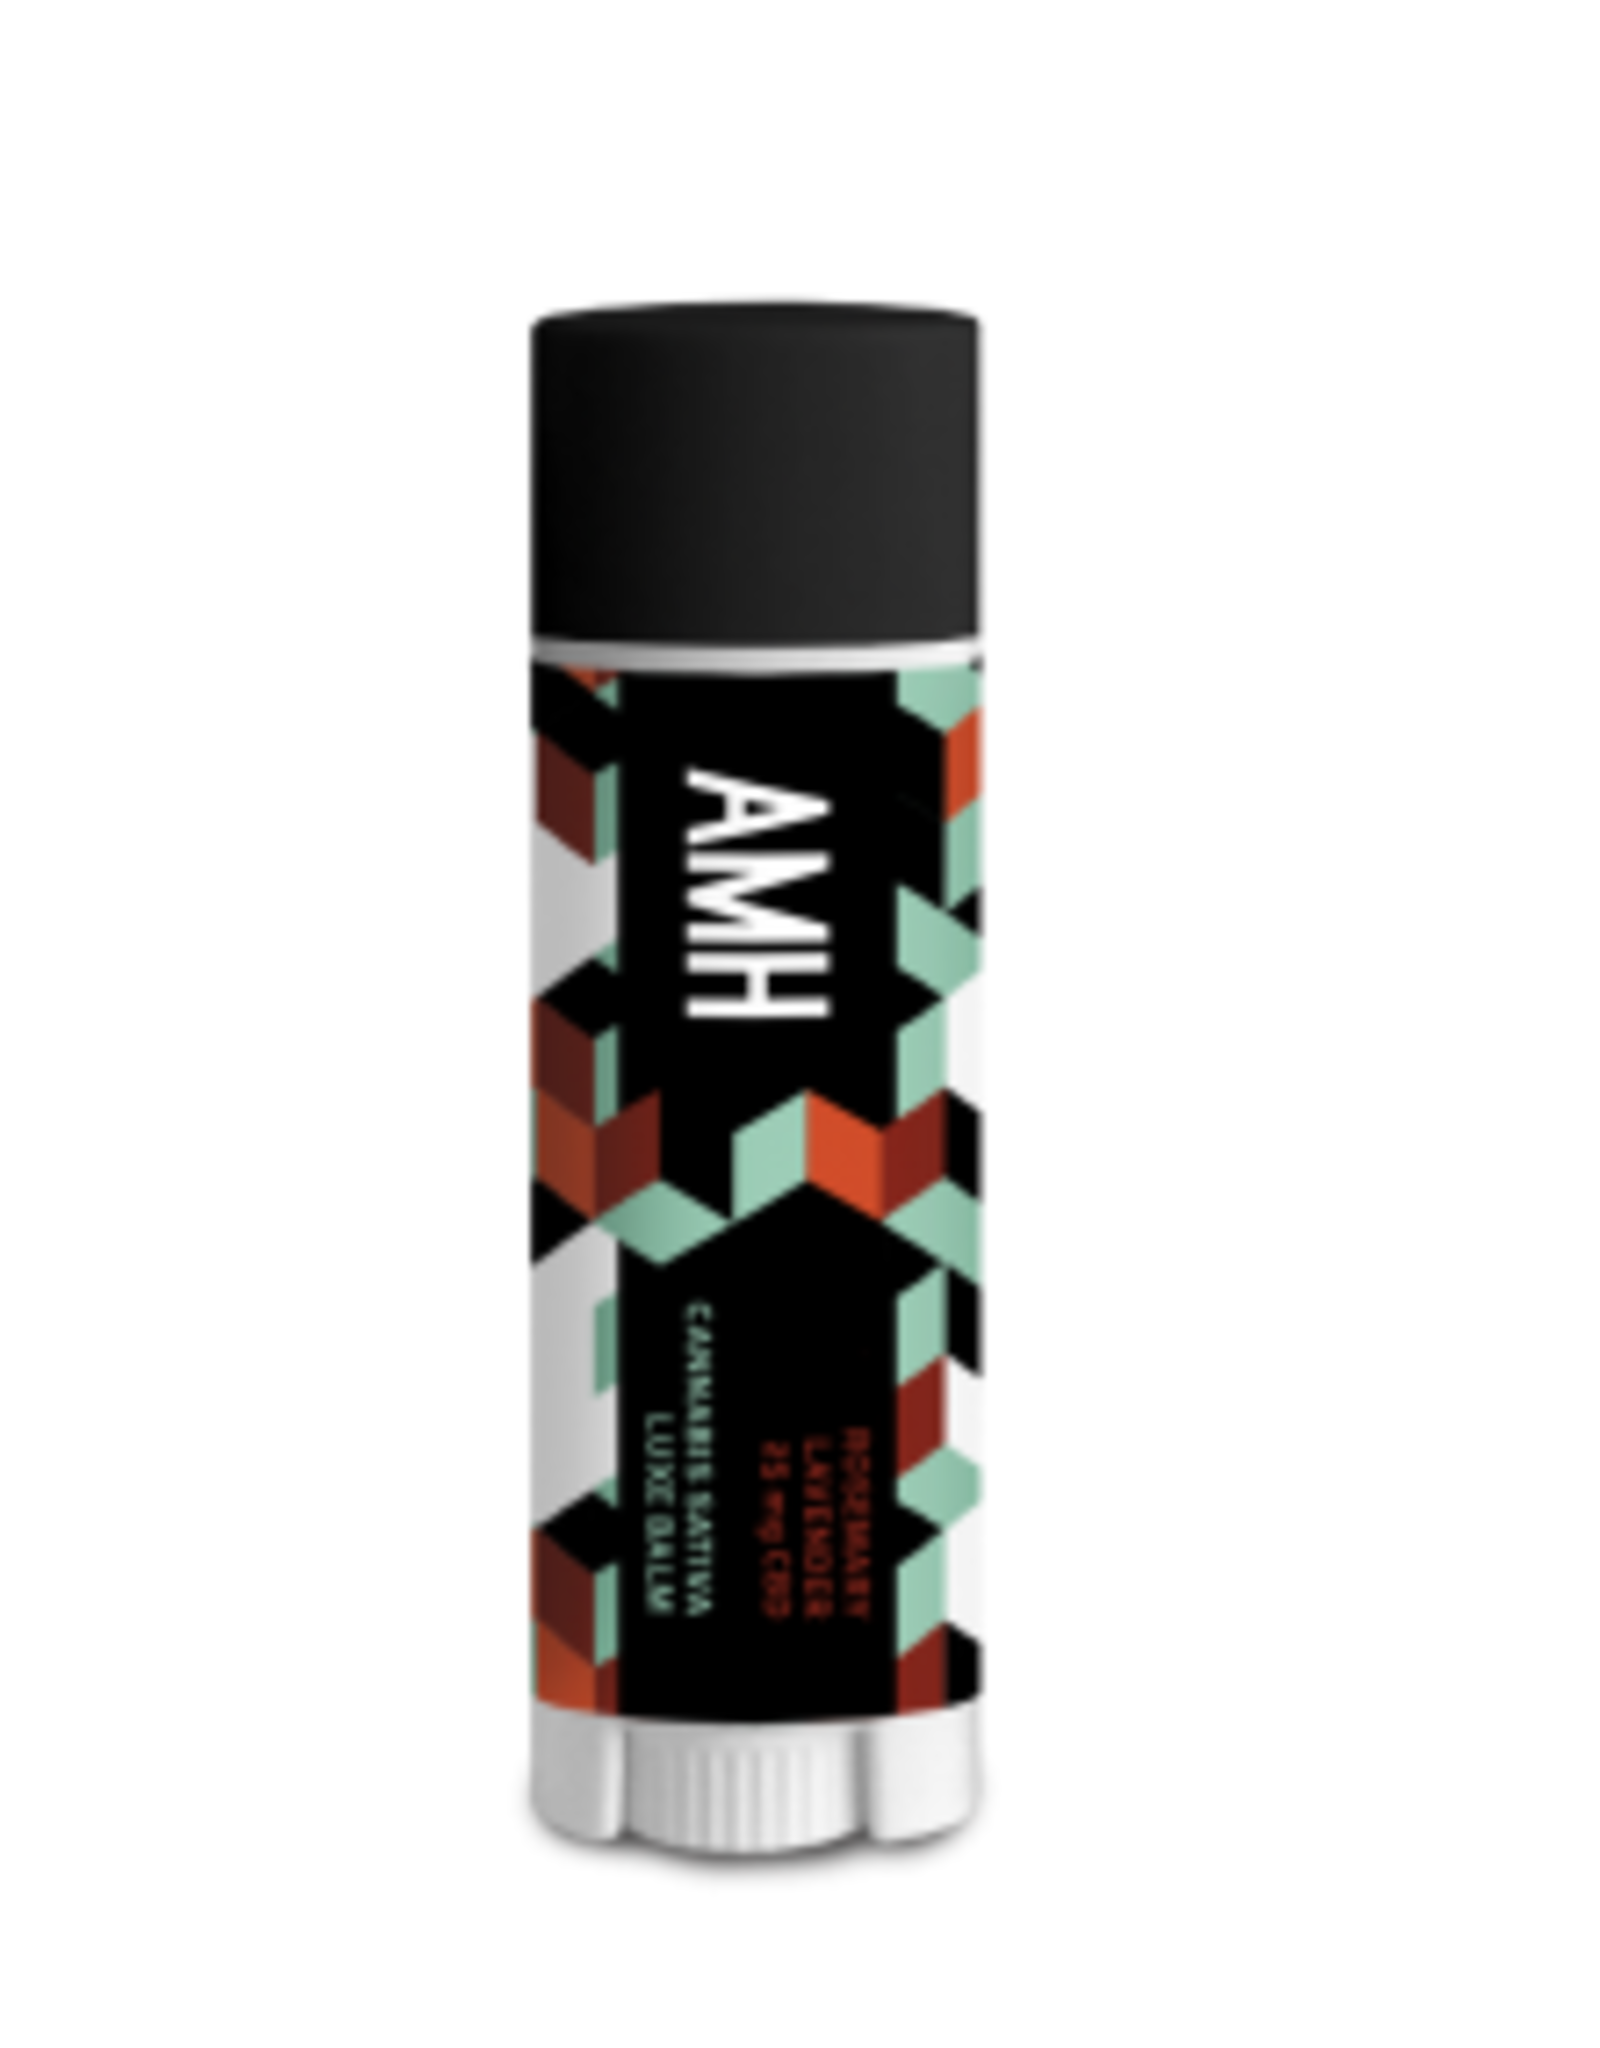 Cannabis Sativa AMH Luxe Lip Balm 25 mg